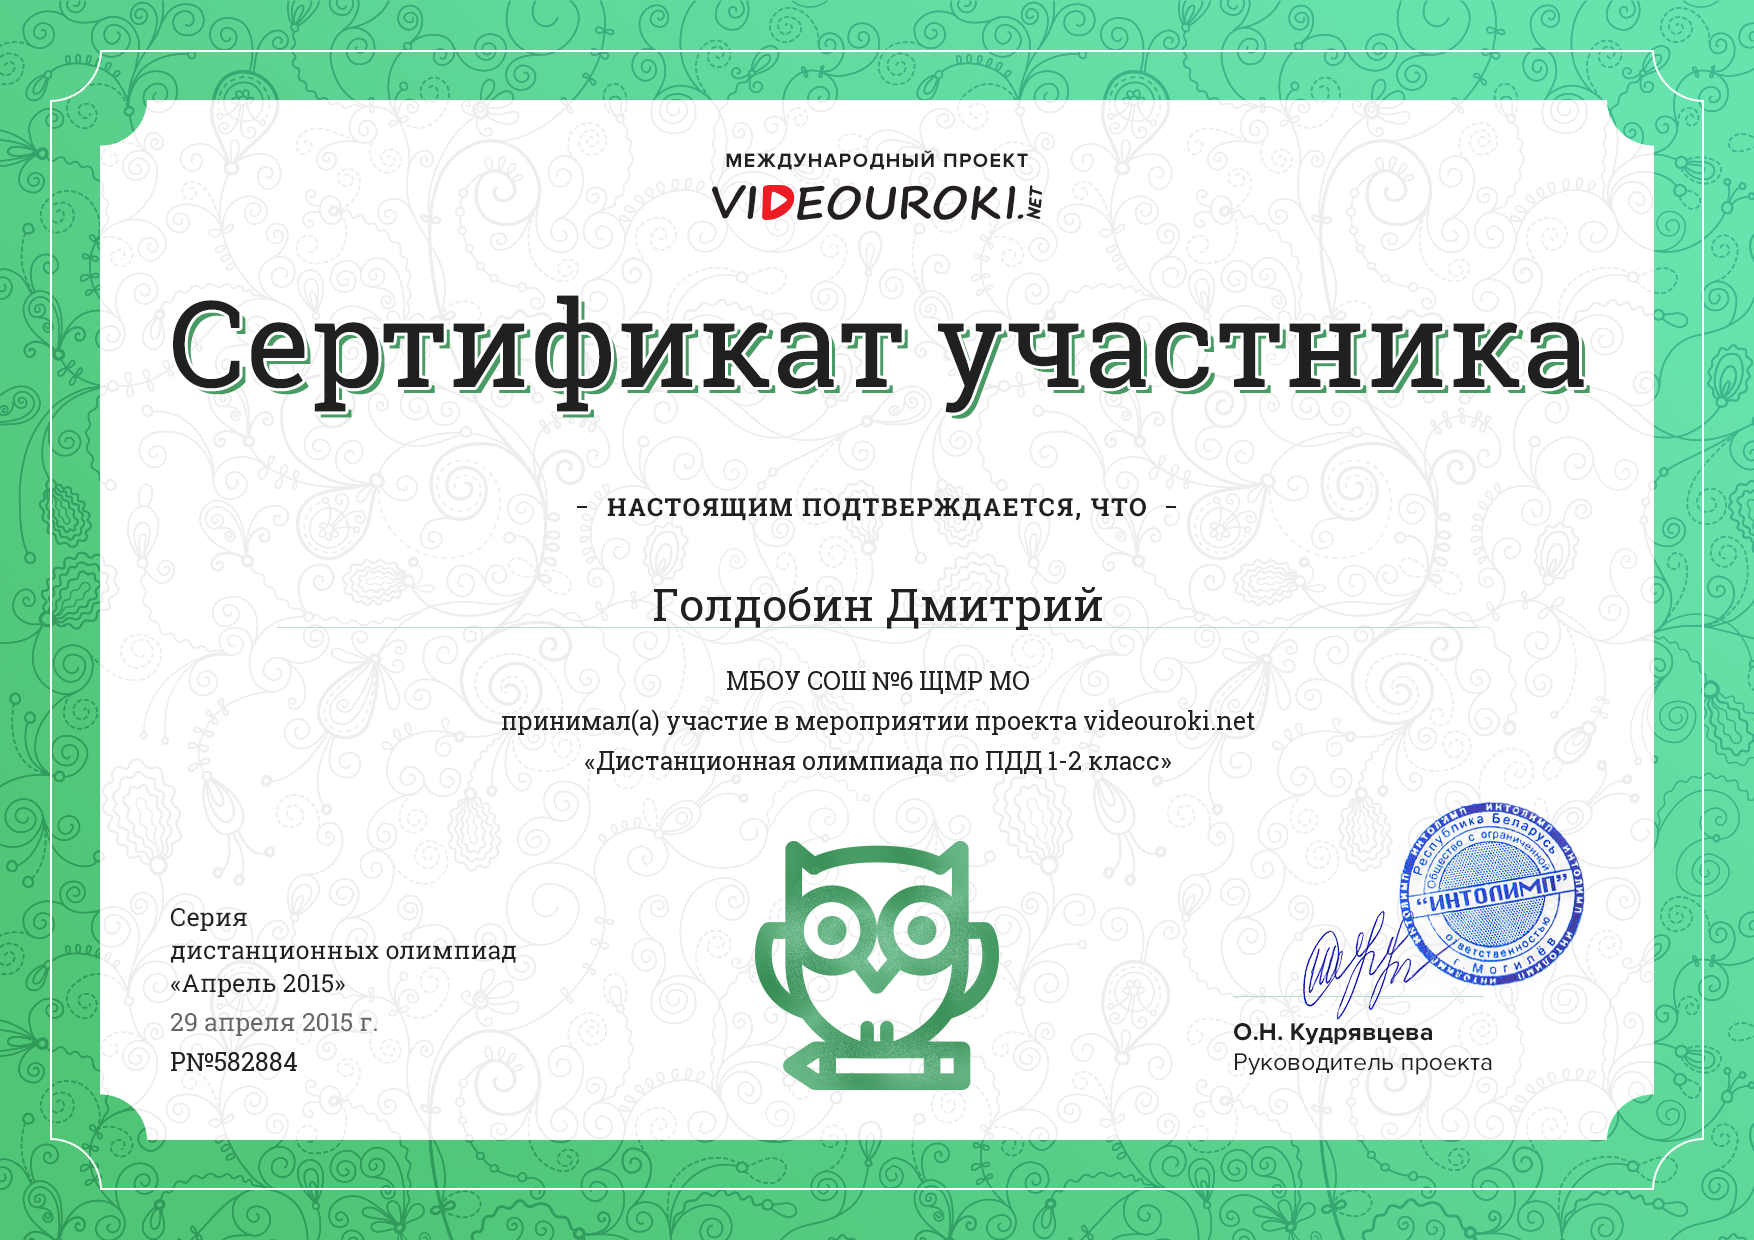 Видеоурокнет конкурсы для детей